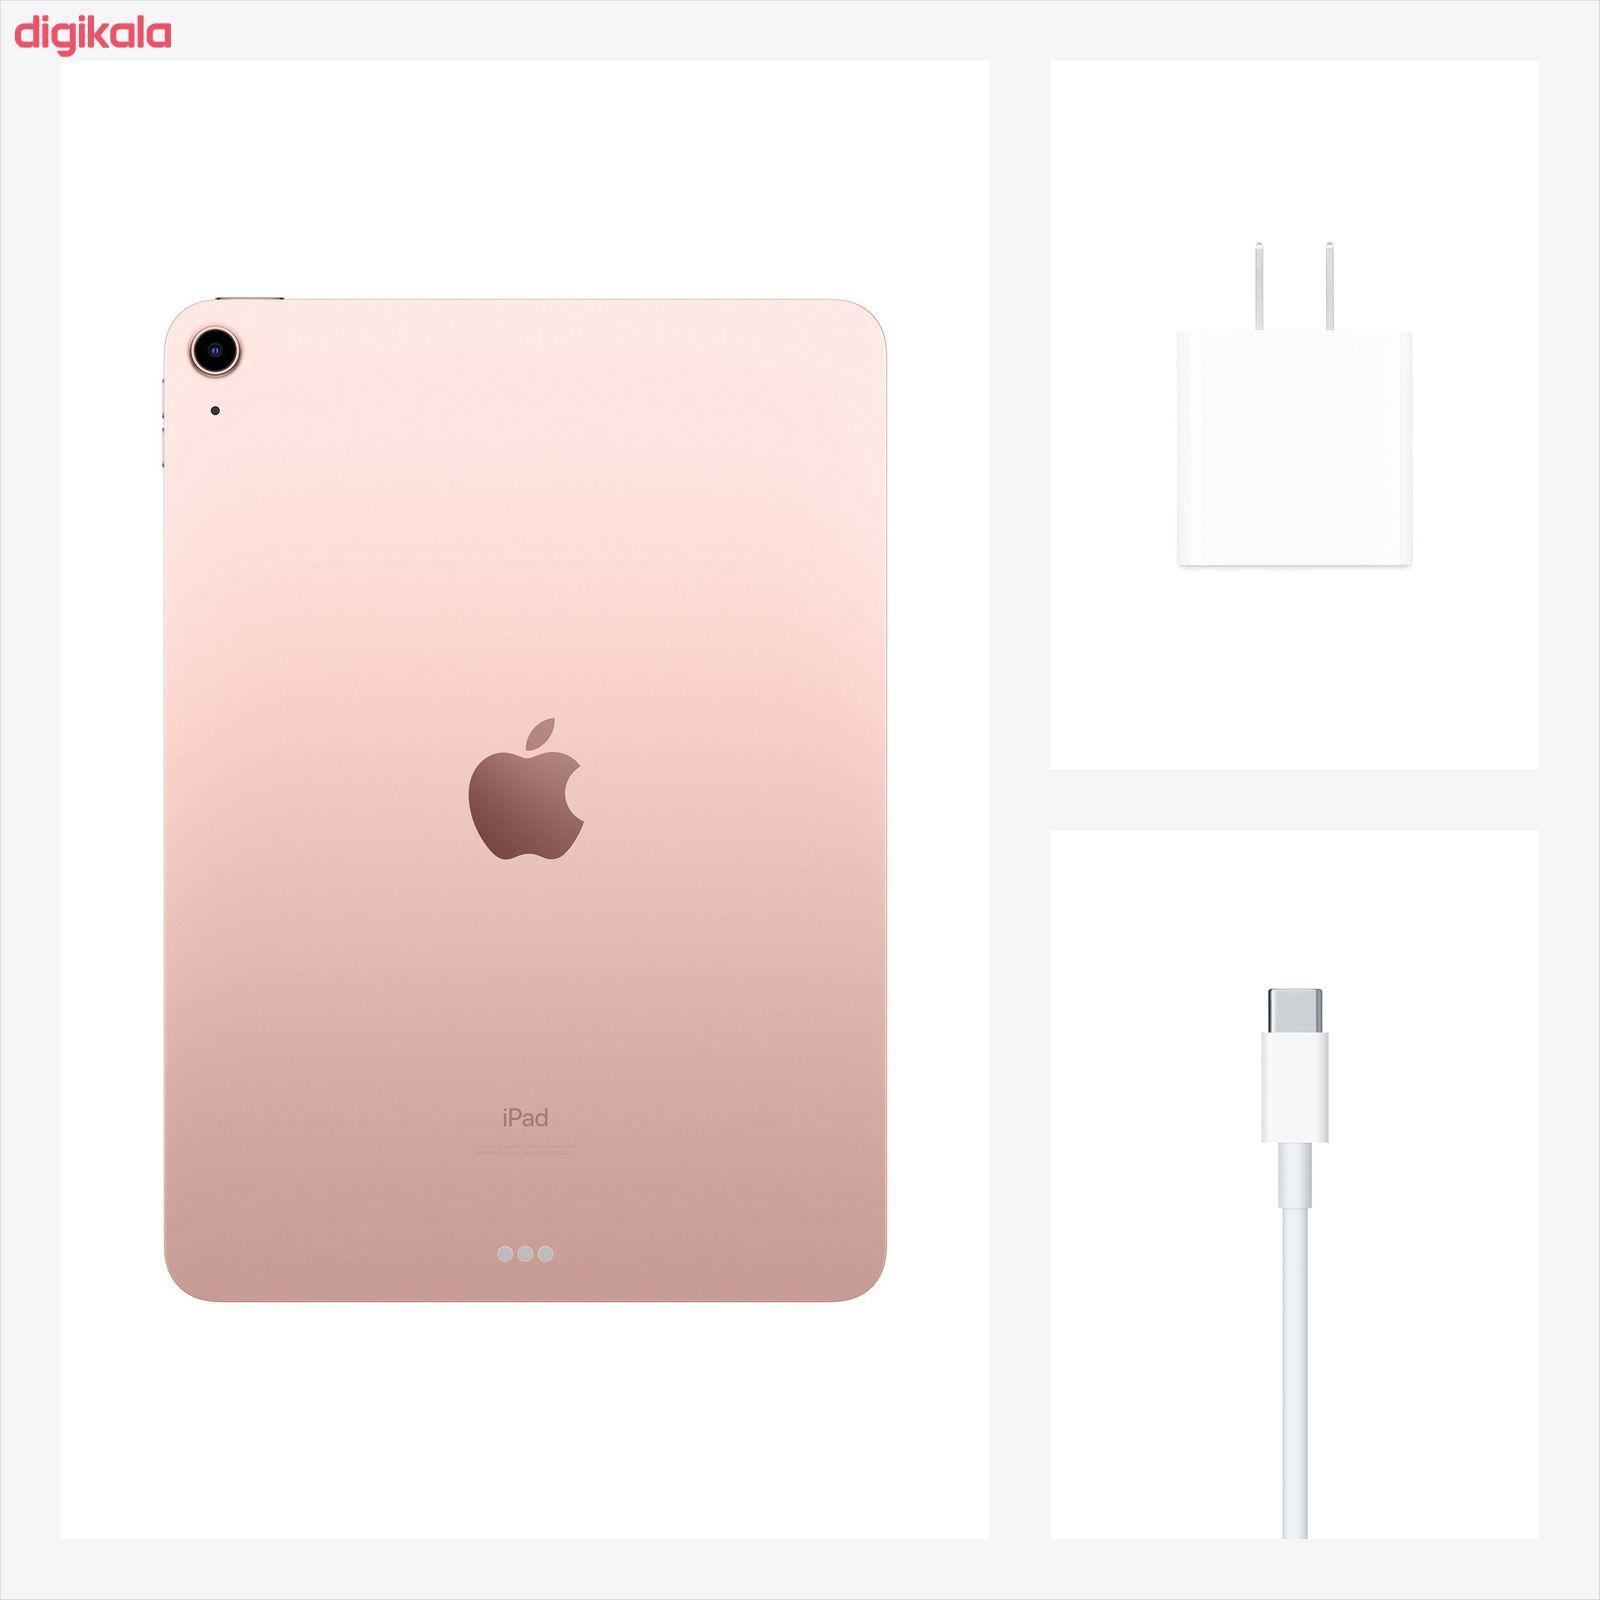 تبلت اپل مدل iPad Air 10.9 inch 2020 WiFi ظرفیت 256 گیگابایت  main 1 12